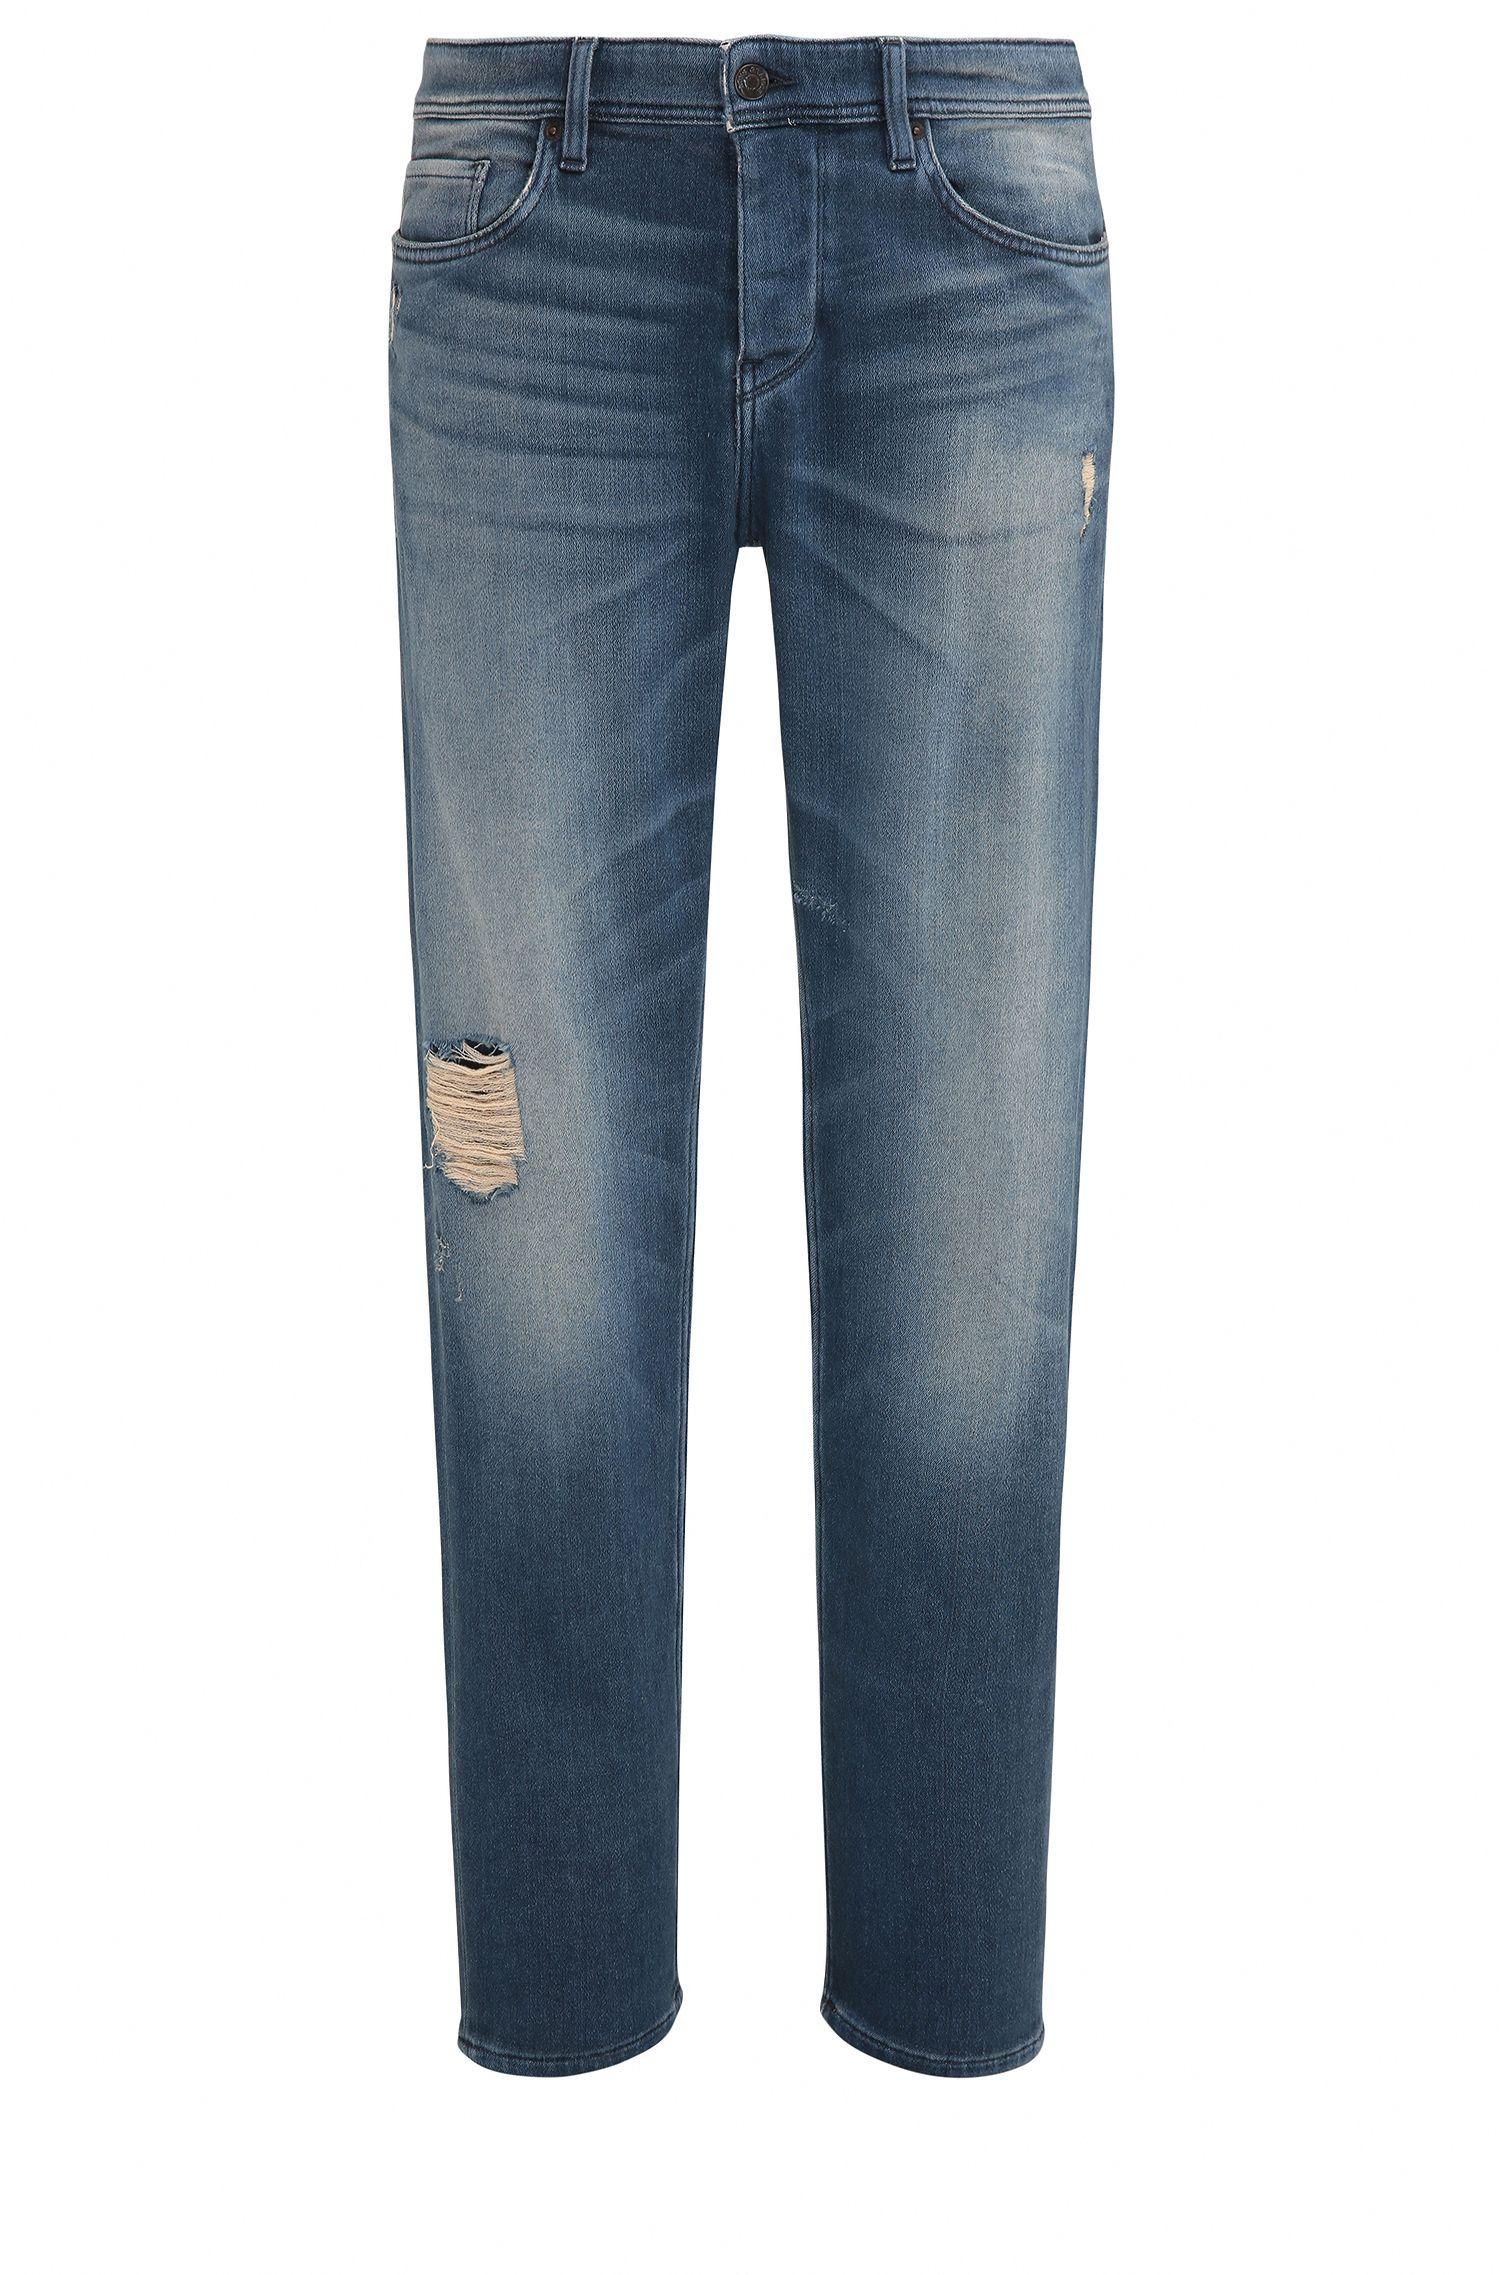 Distressed Stretch Cotton Jean, Tapered Fit | Orange90, Dark Blue